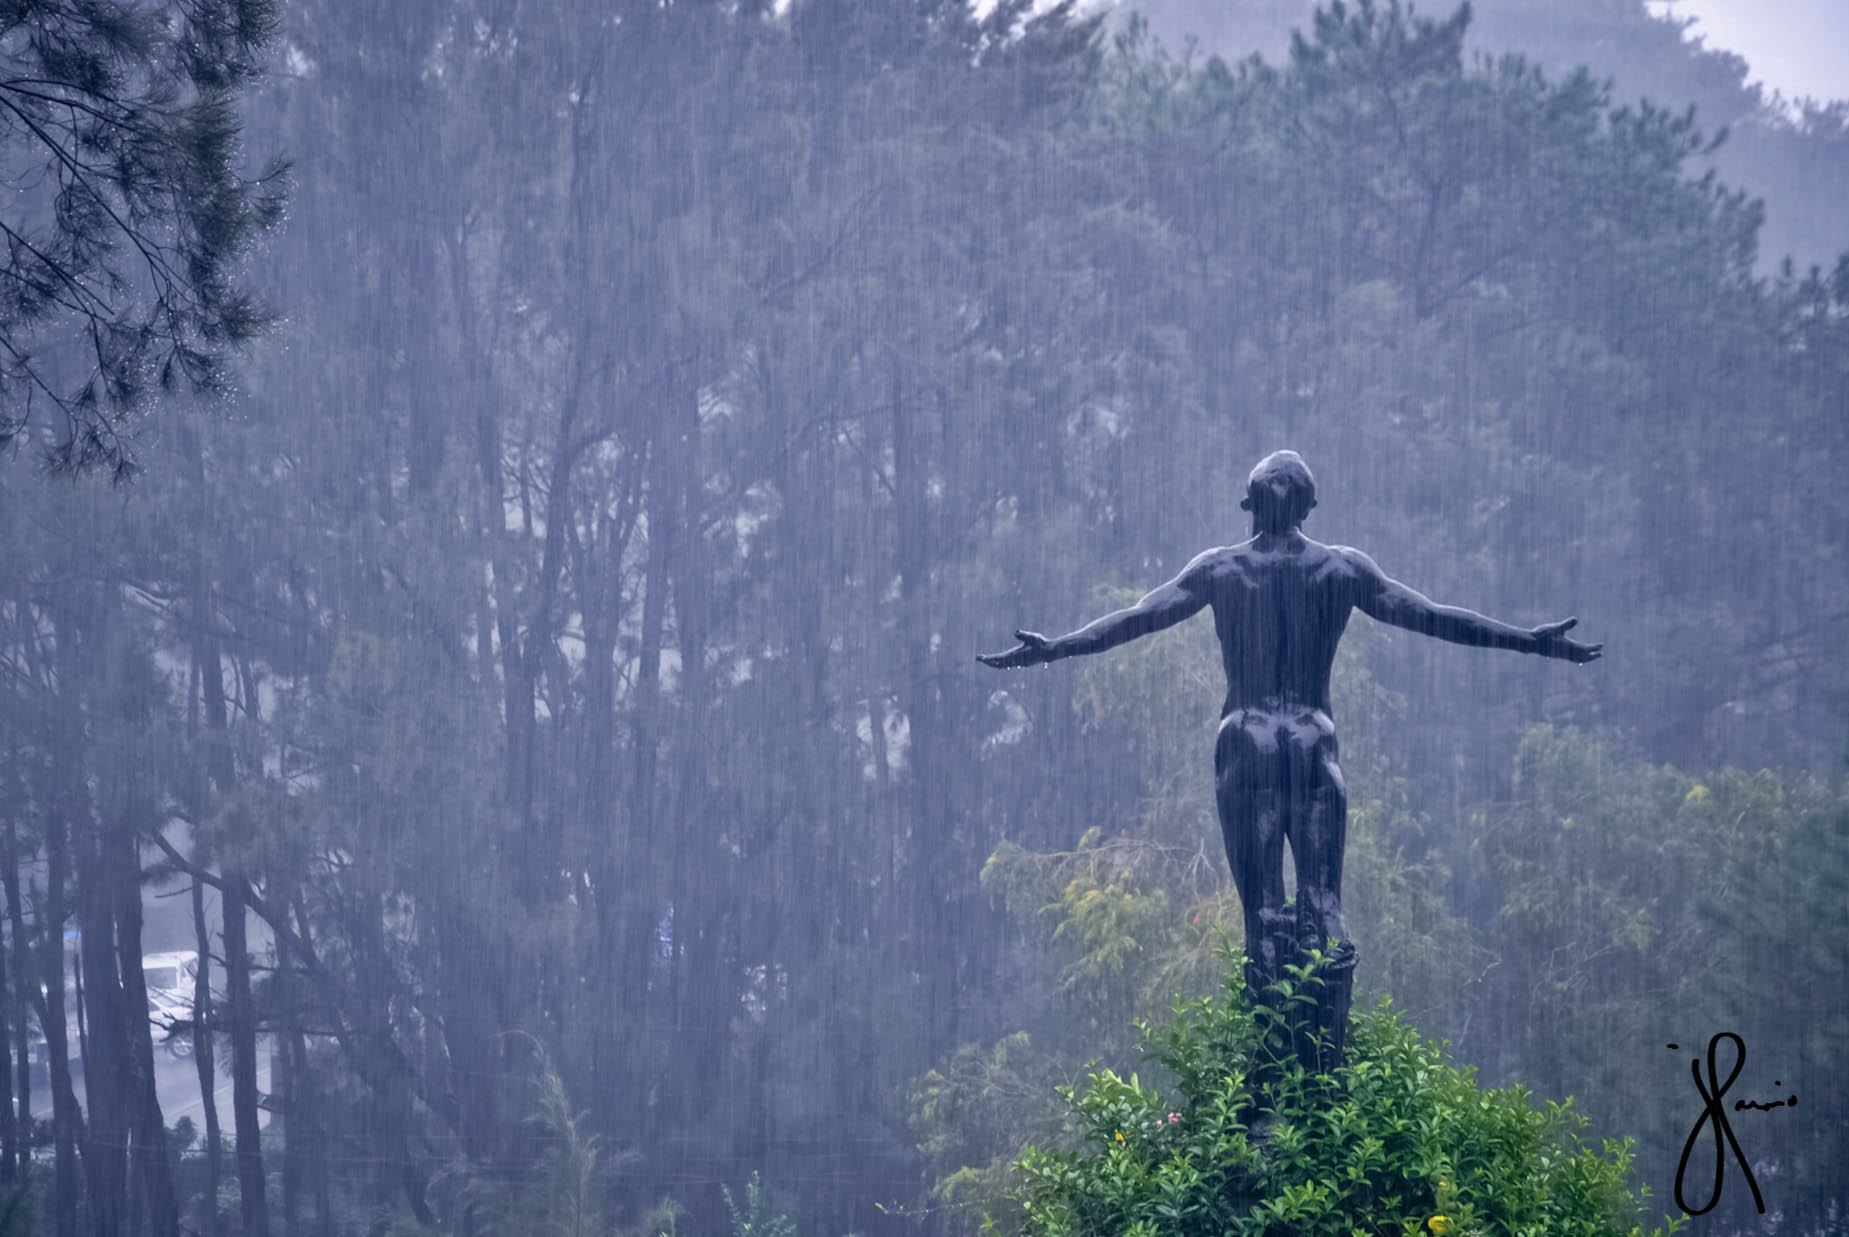 Wet And Hard. by isangkilongkamera